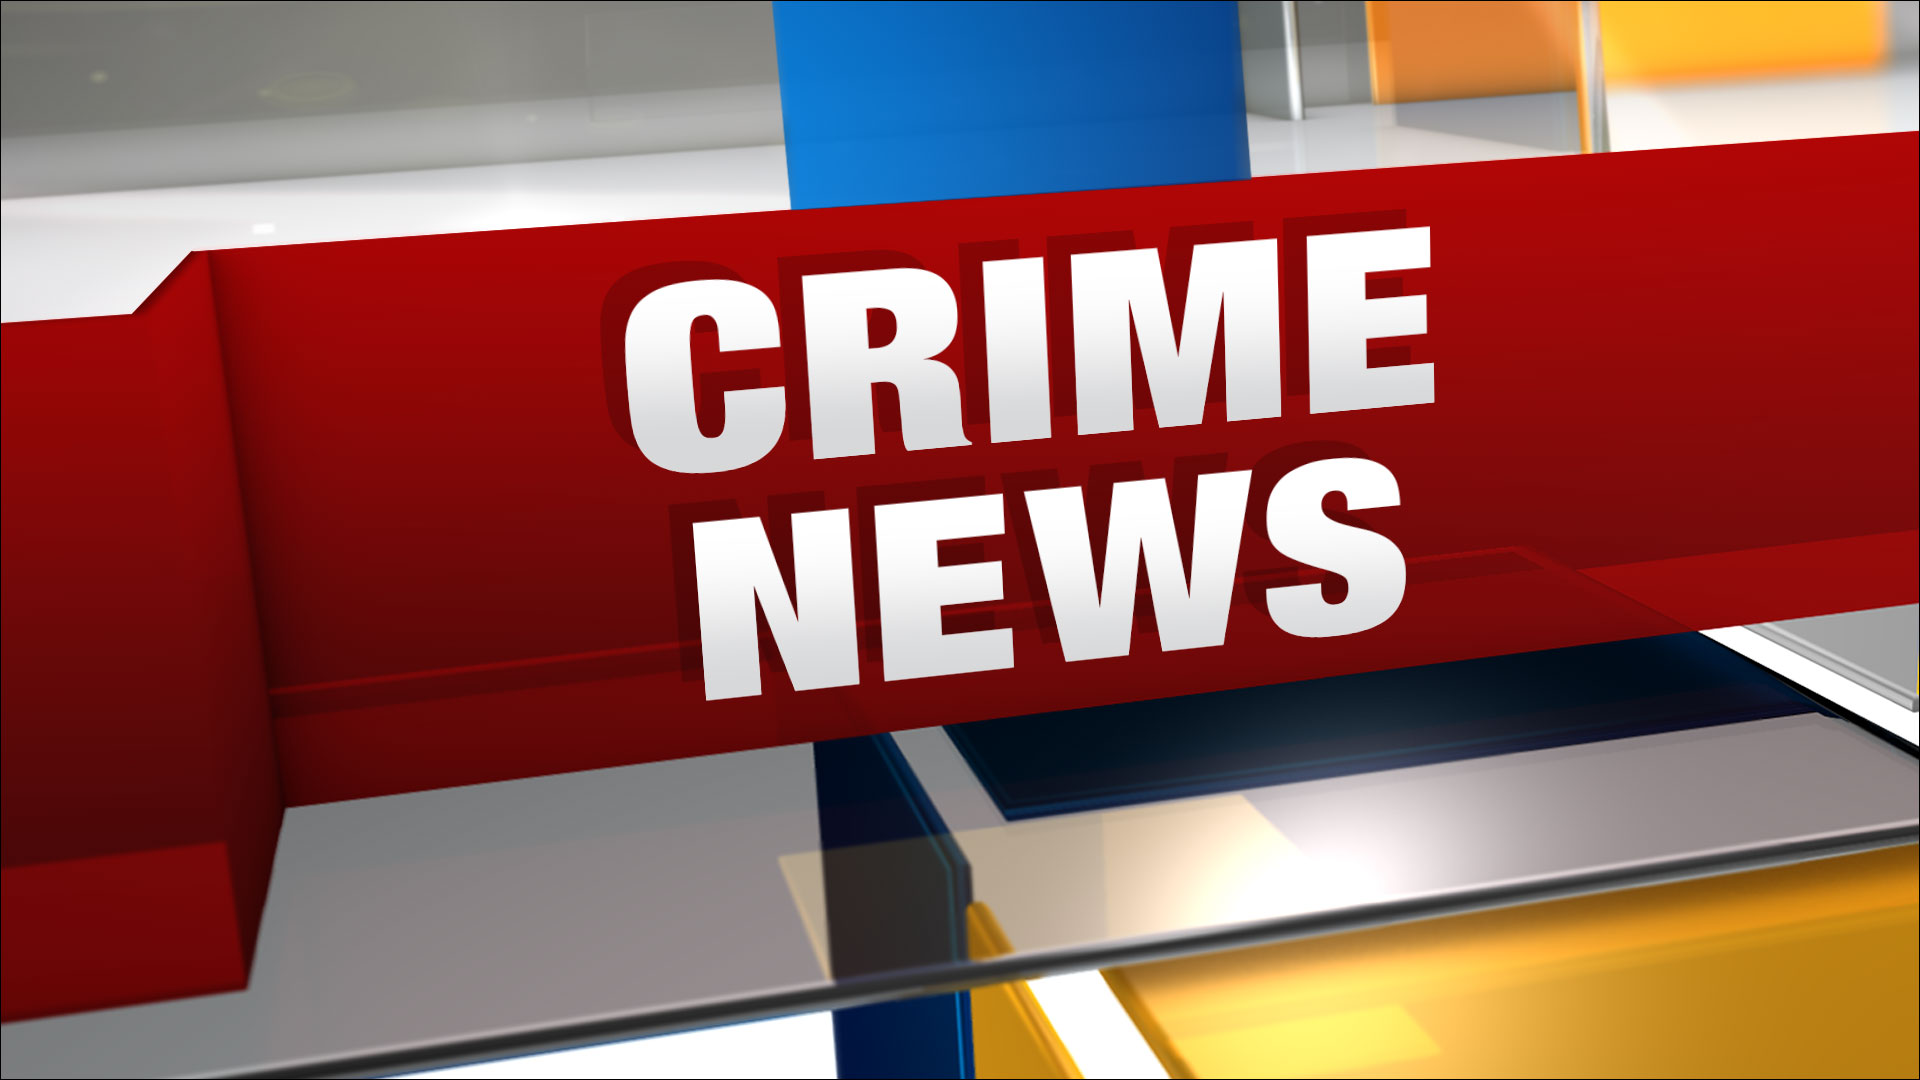 CRIME News Generic